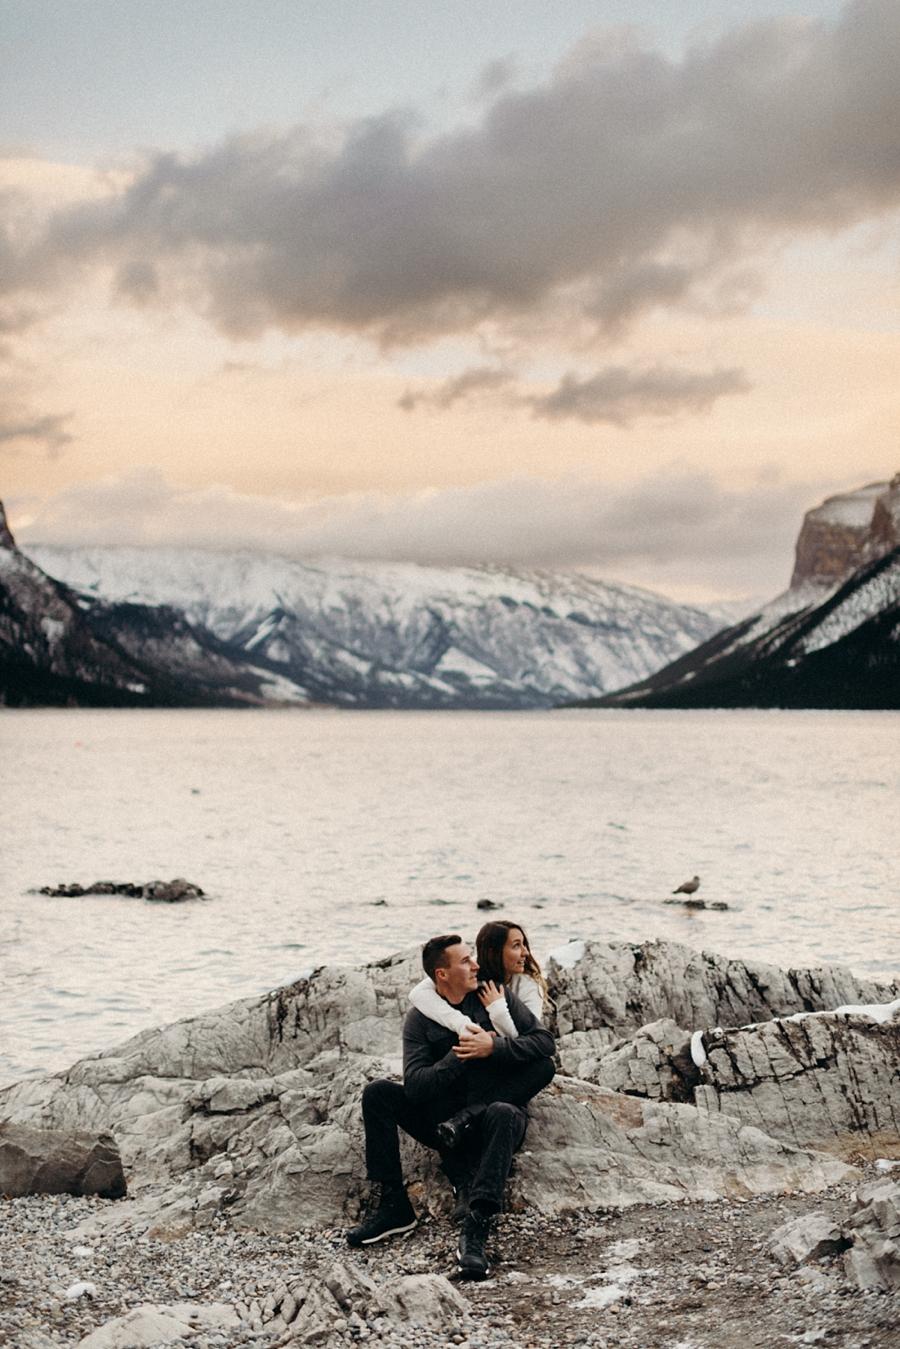 kaihla_tonai_intimate_wedding_elopement_photographer_7308.jpg